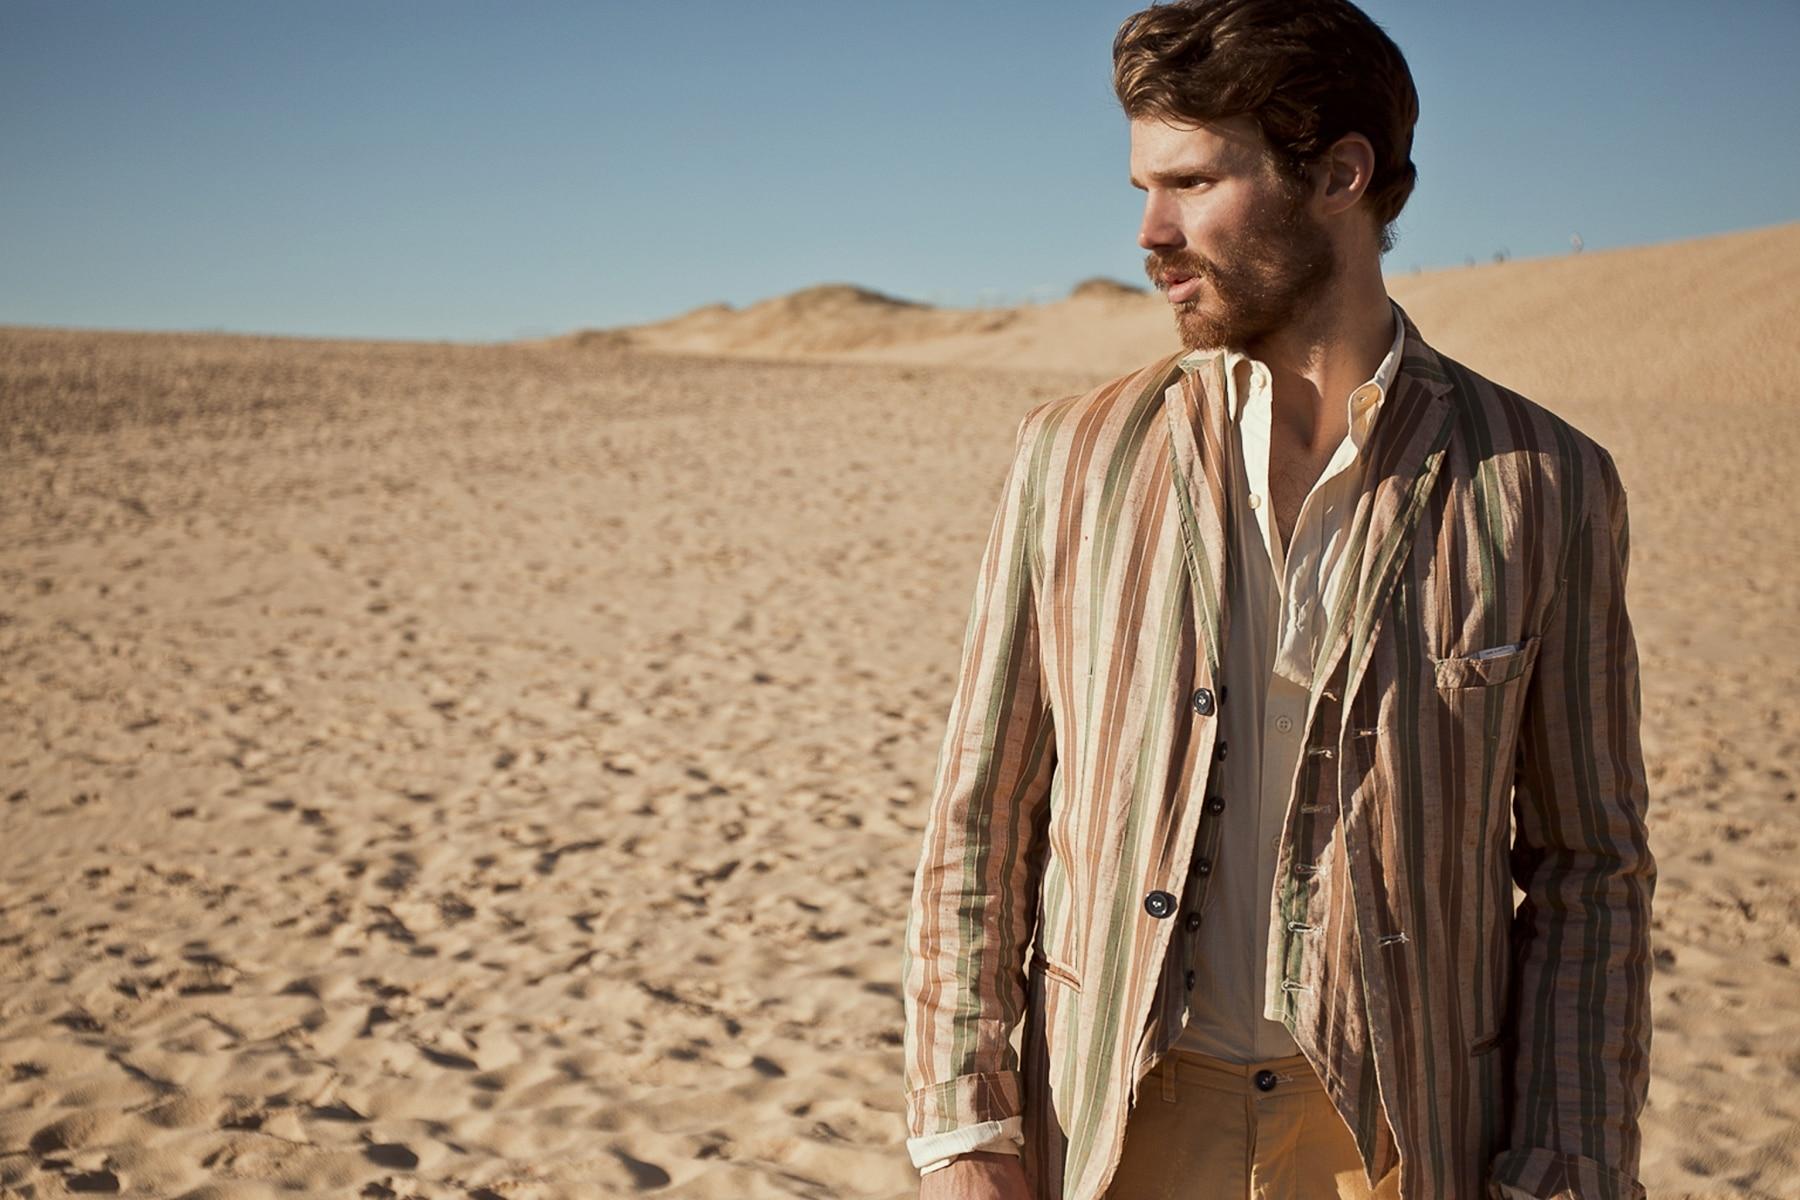 ian nessick men standing desert